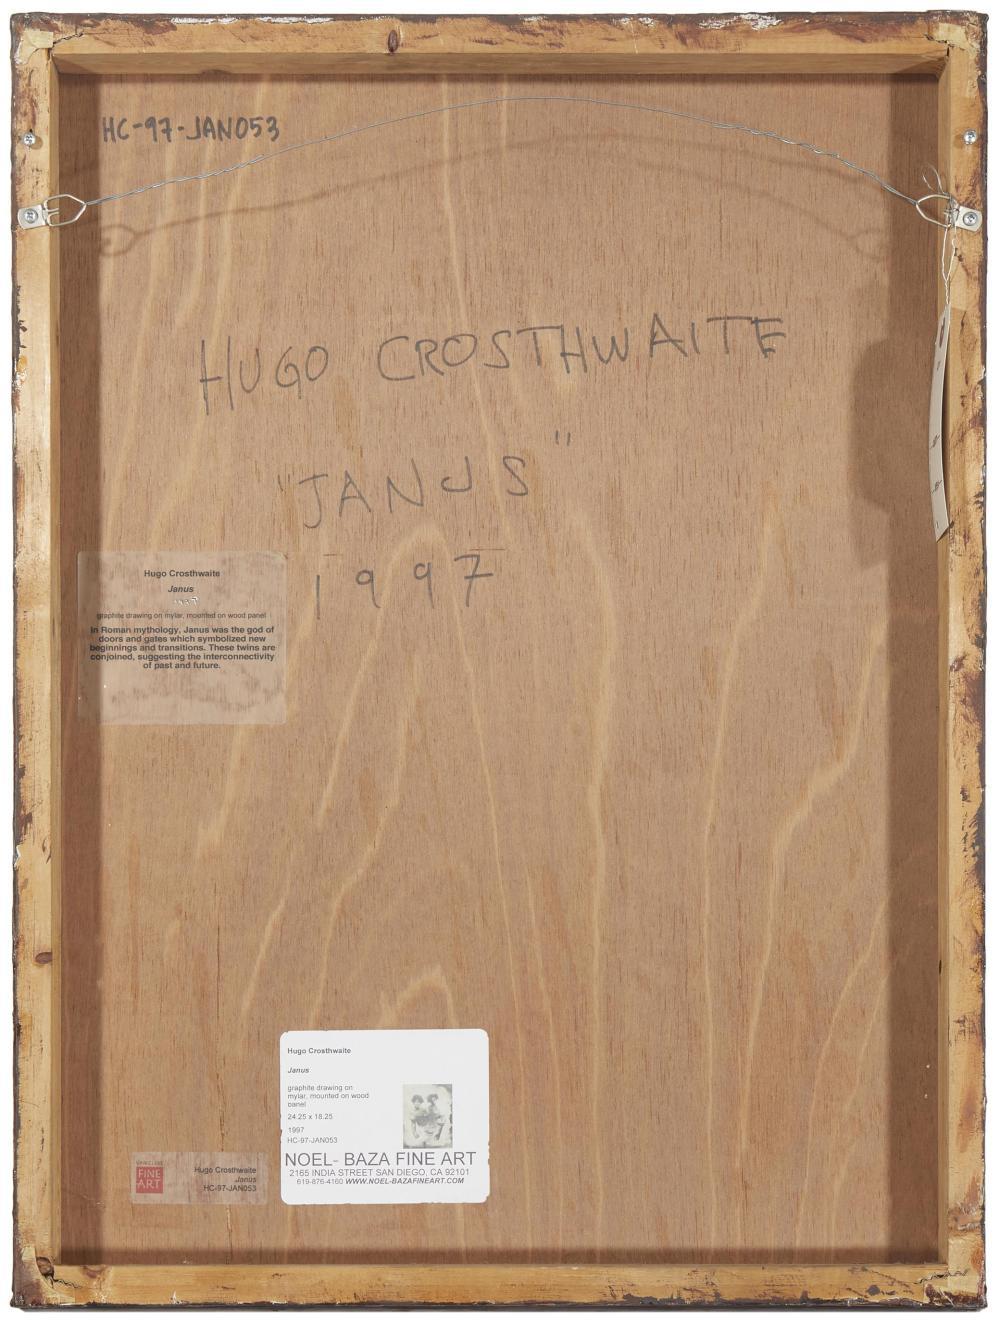 Hugo Crosthwaite, (b. 1971, Mexican/American),